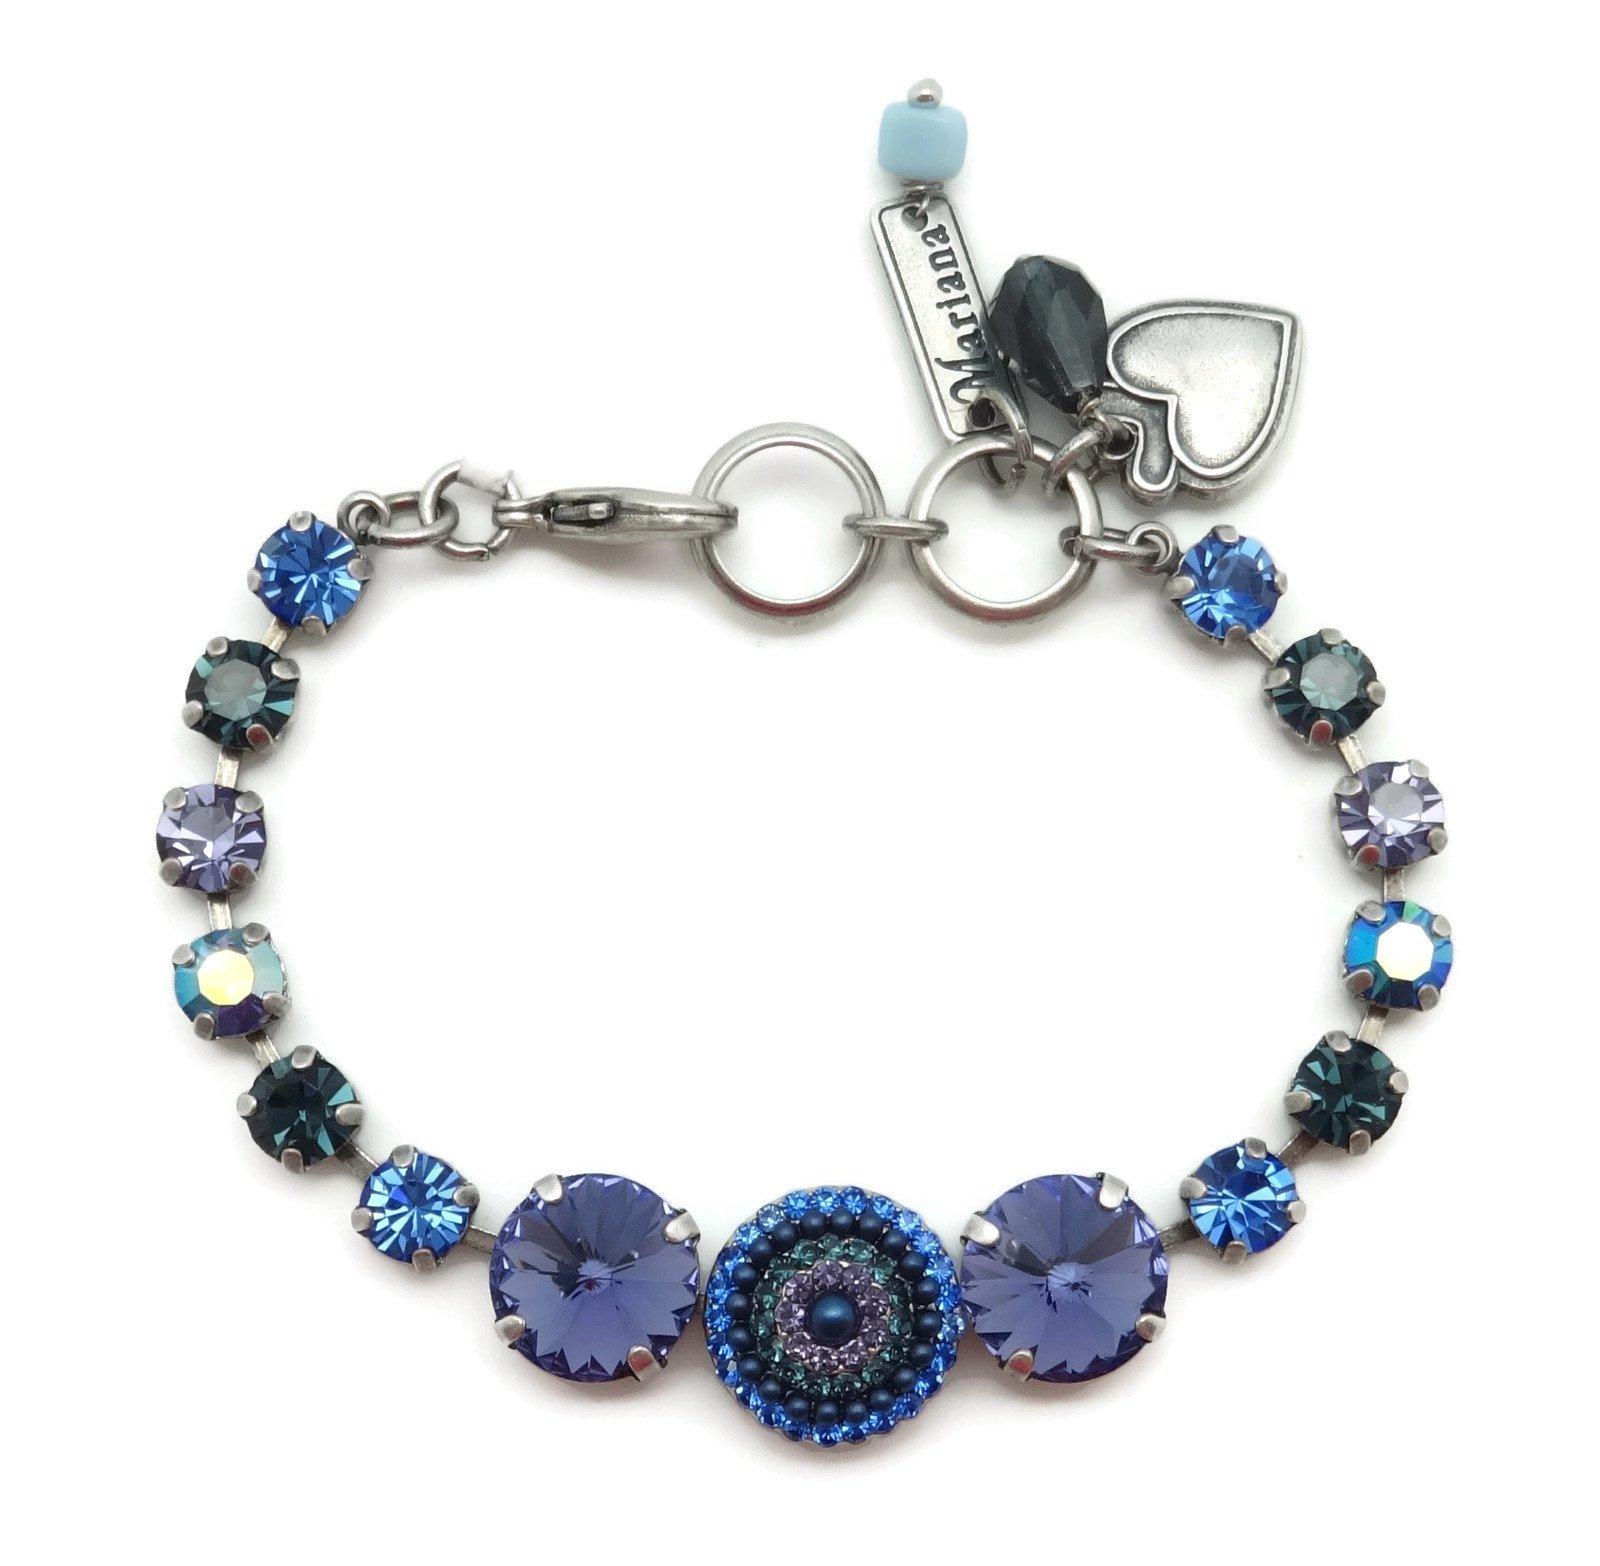 Mariana Silver Plated Swarovski Crystal Bracelet Rivoli Purple Circle 1026 Odyssey Electra